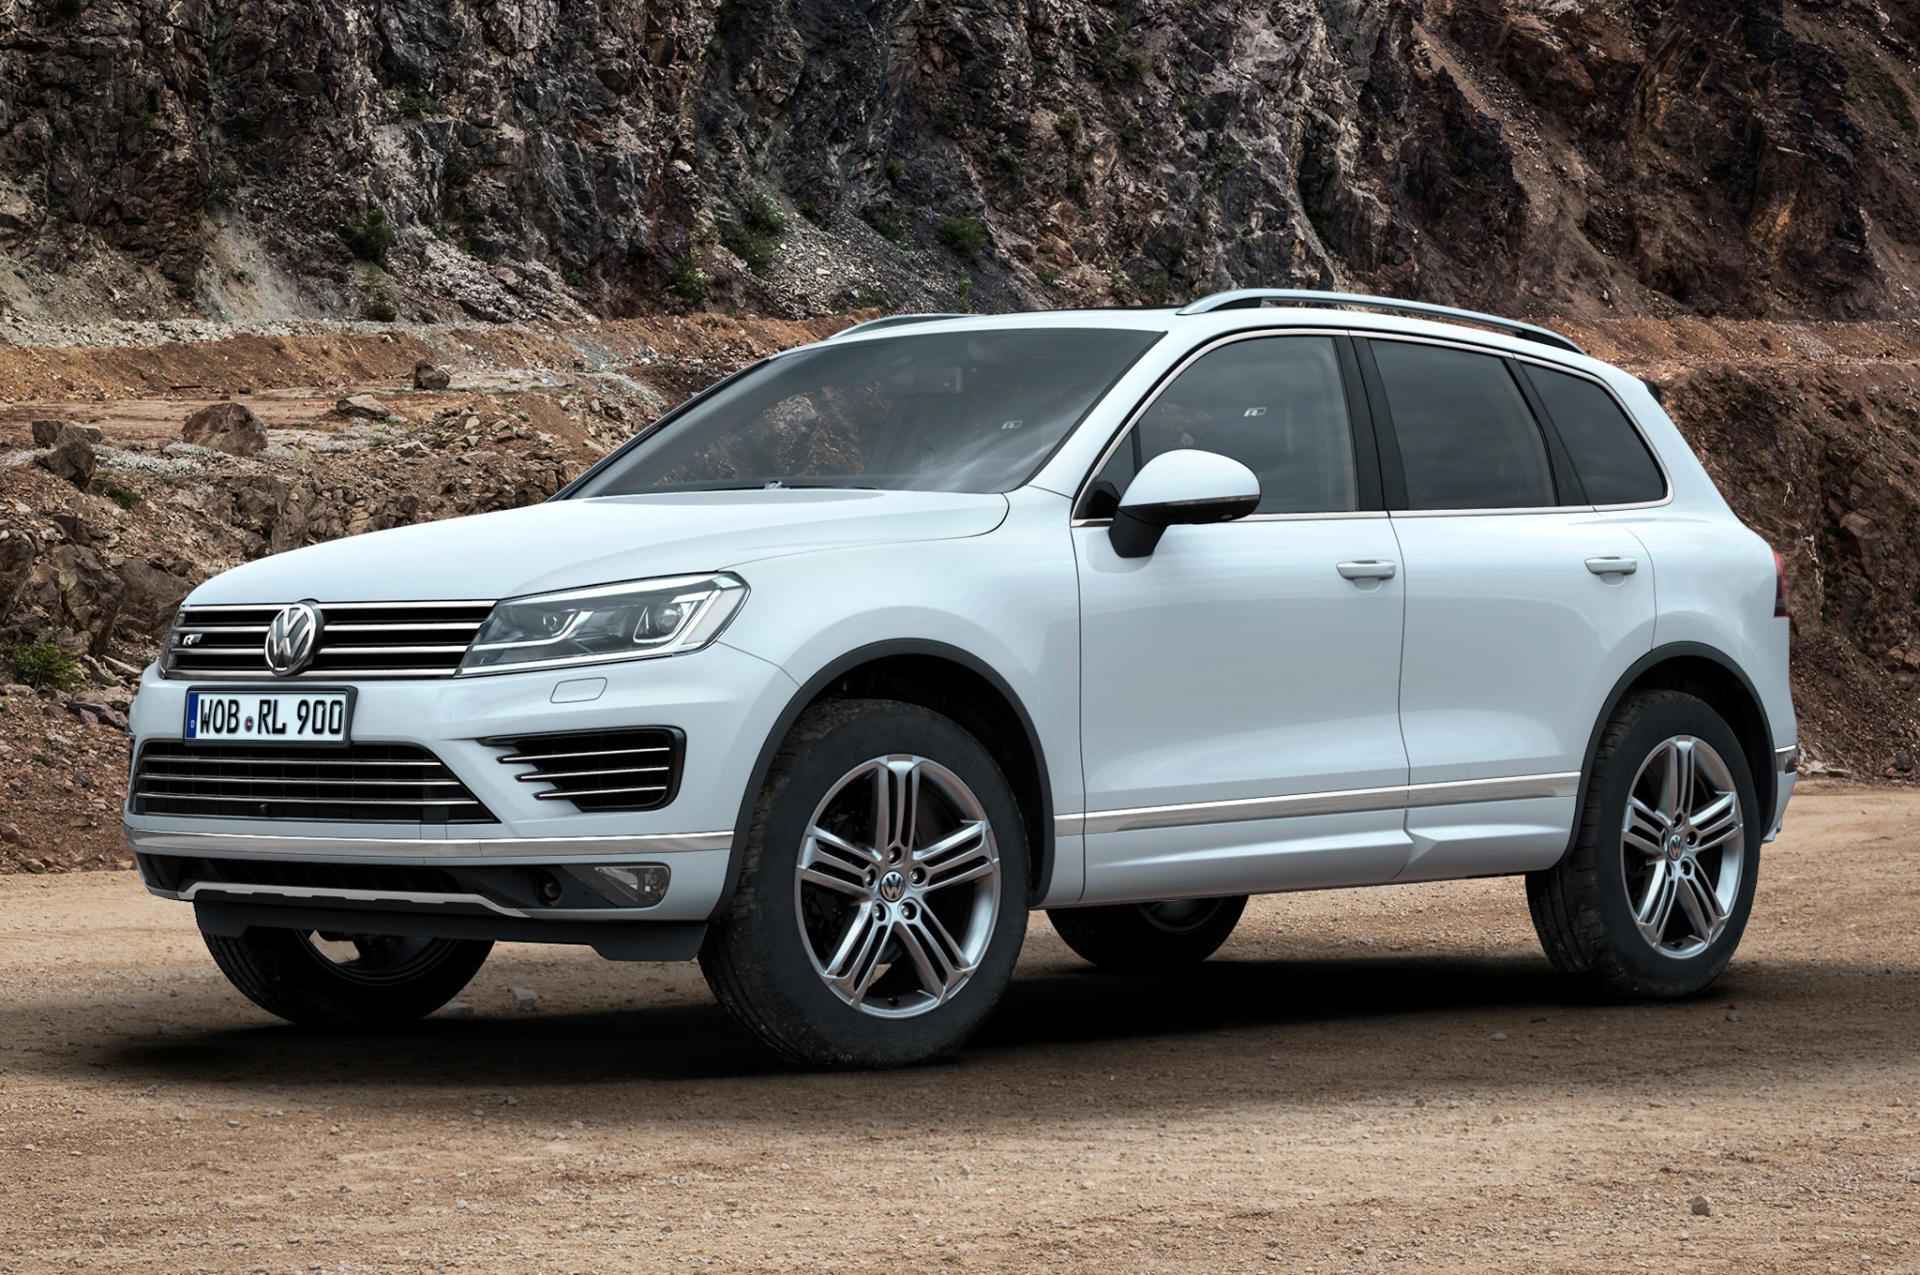 2015 Volkswagen Touareg Review